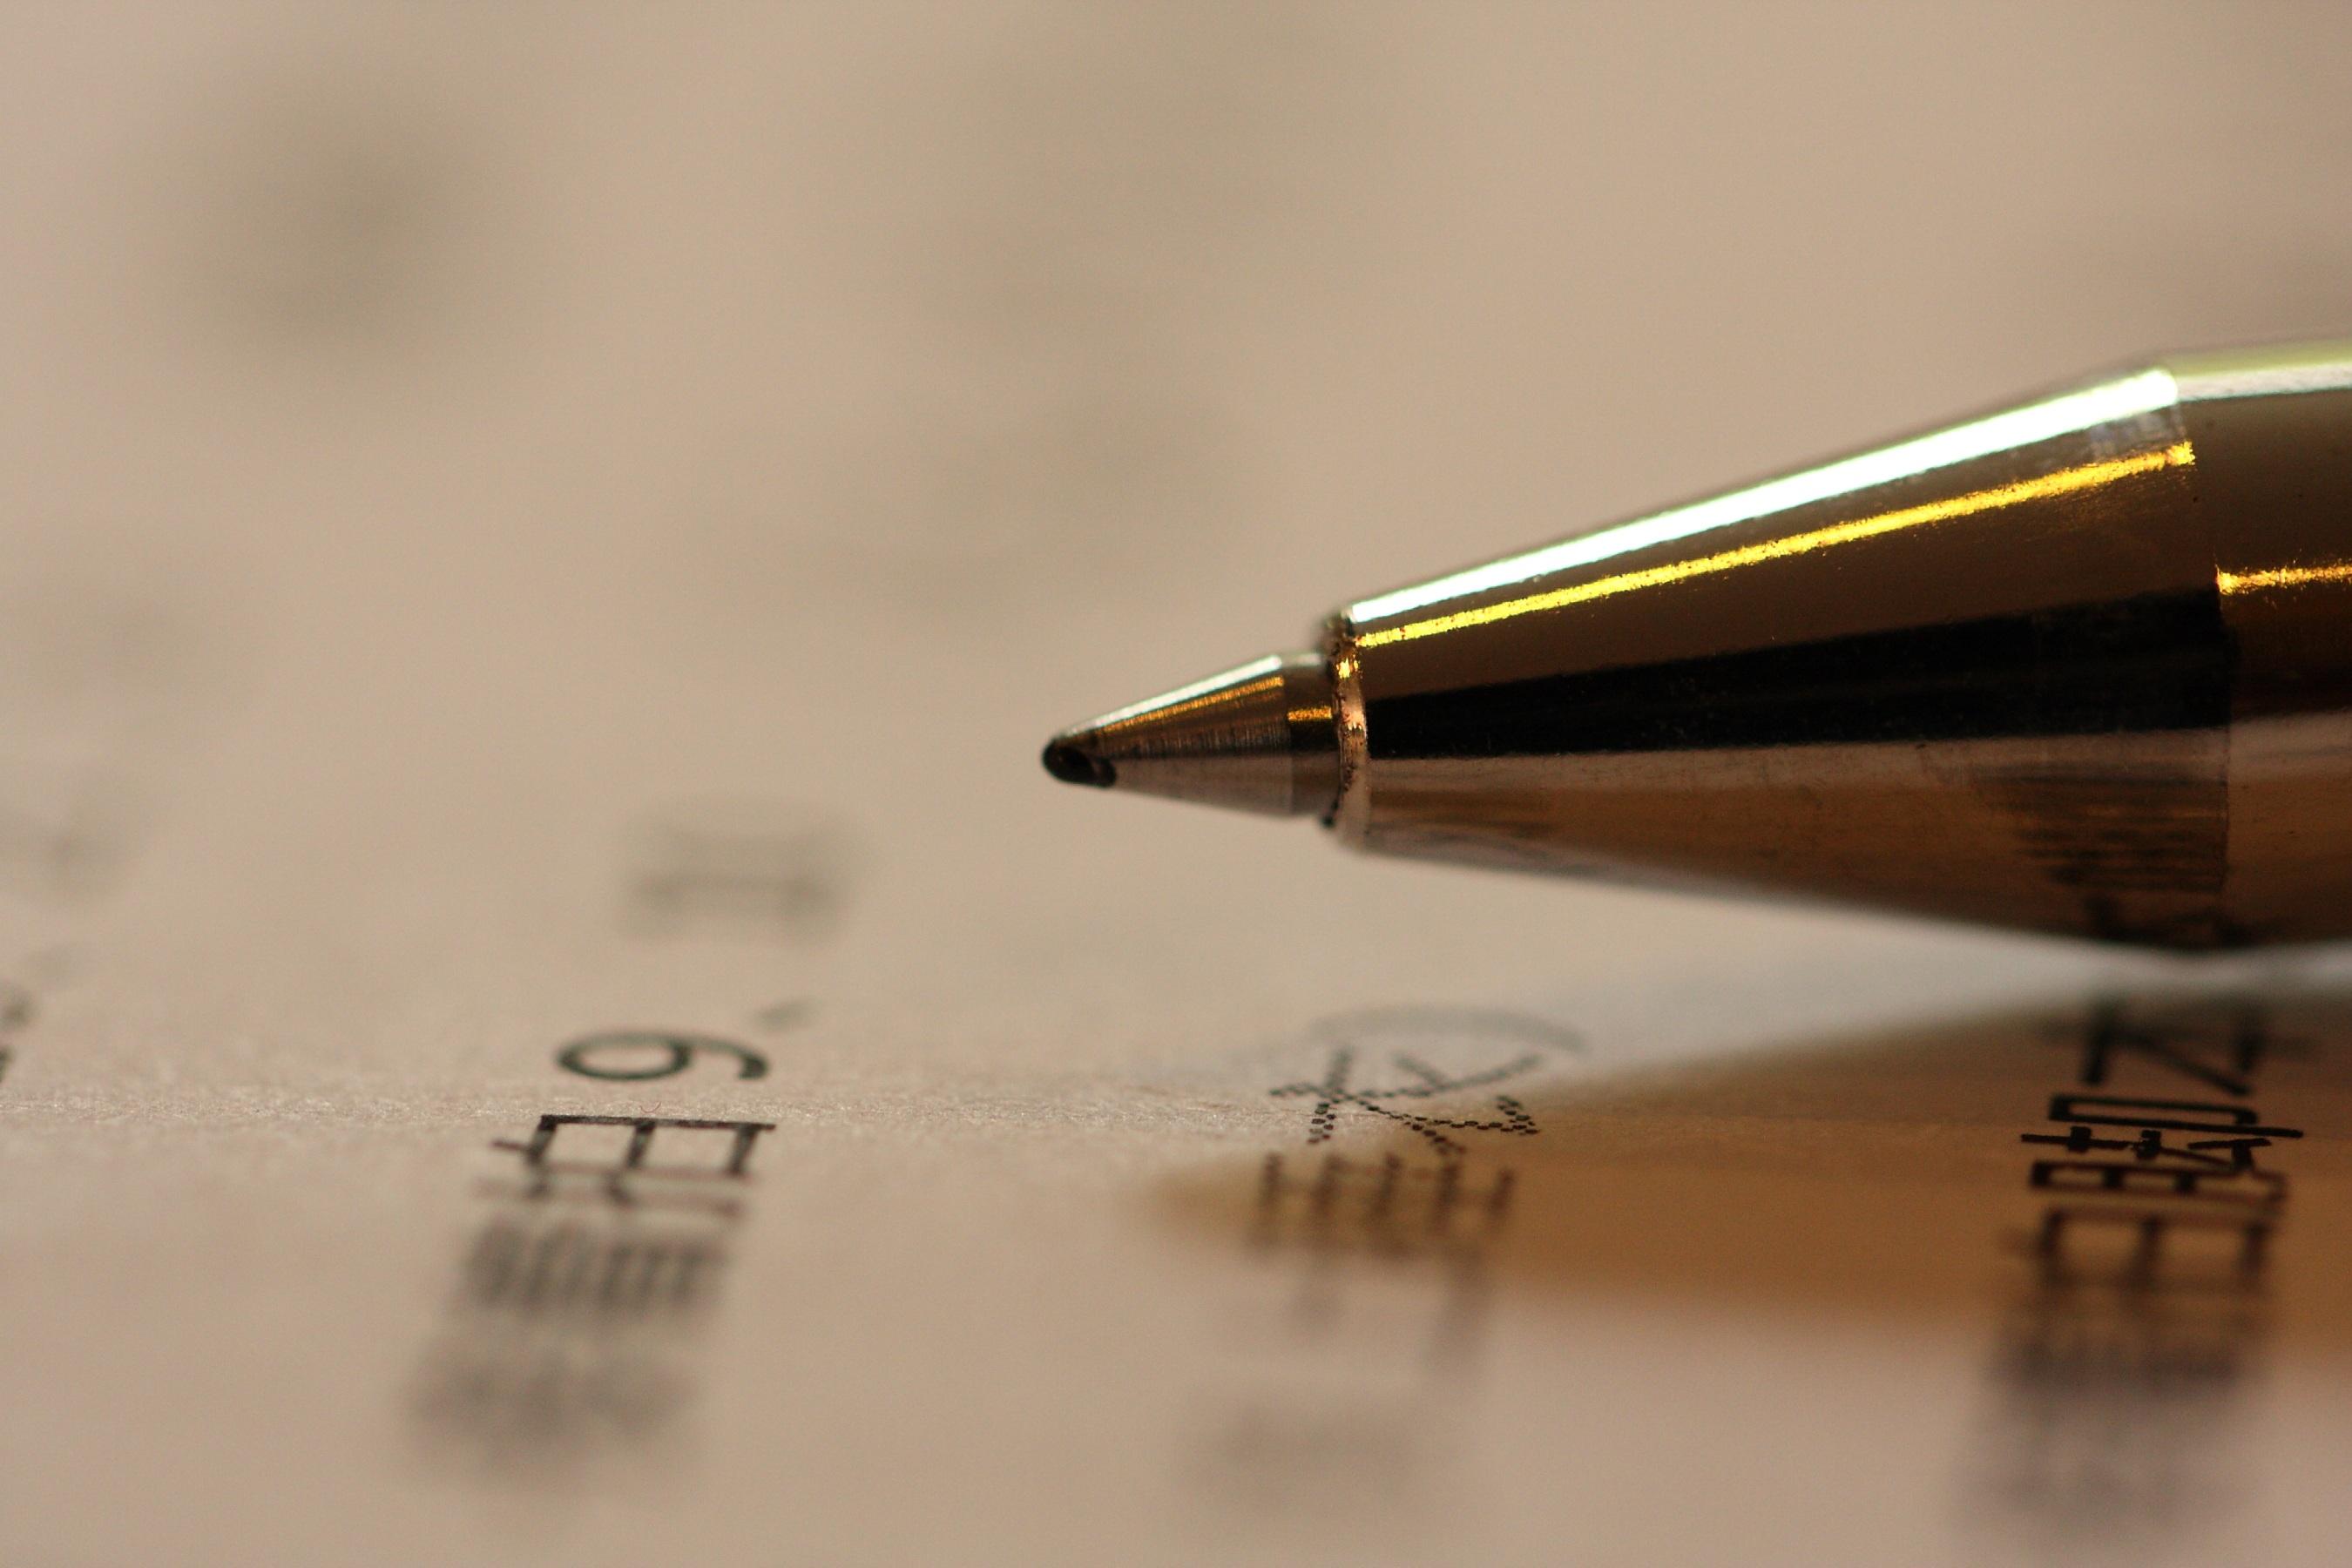 free images : writing, pen, paper, file, nib, close up, text, macro